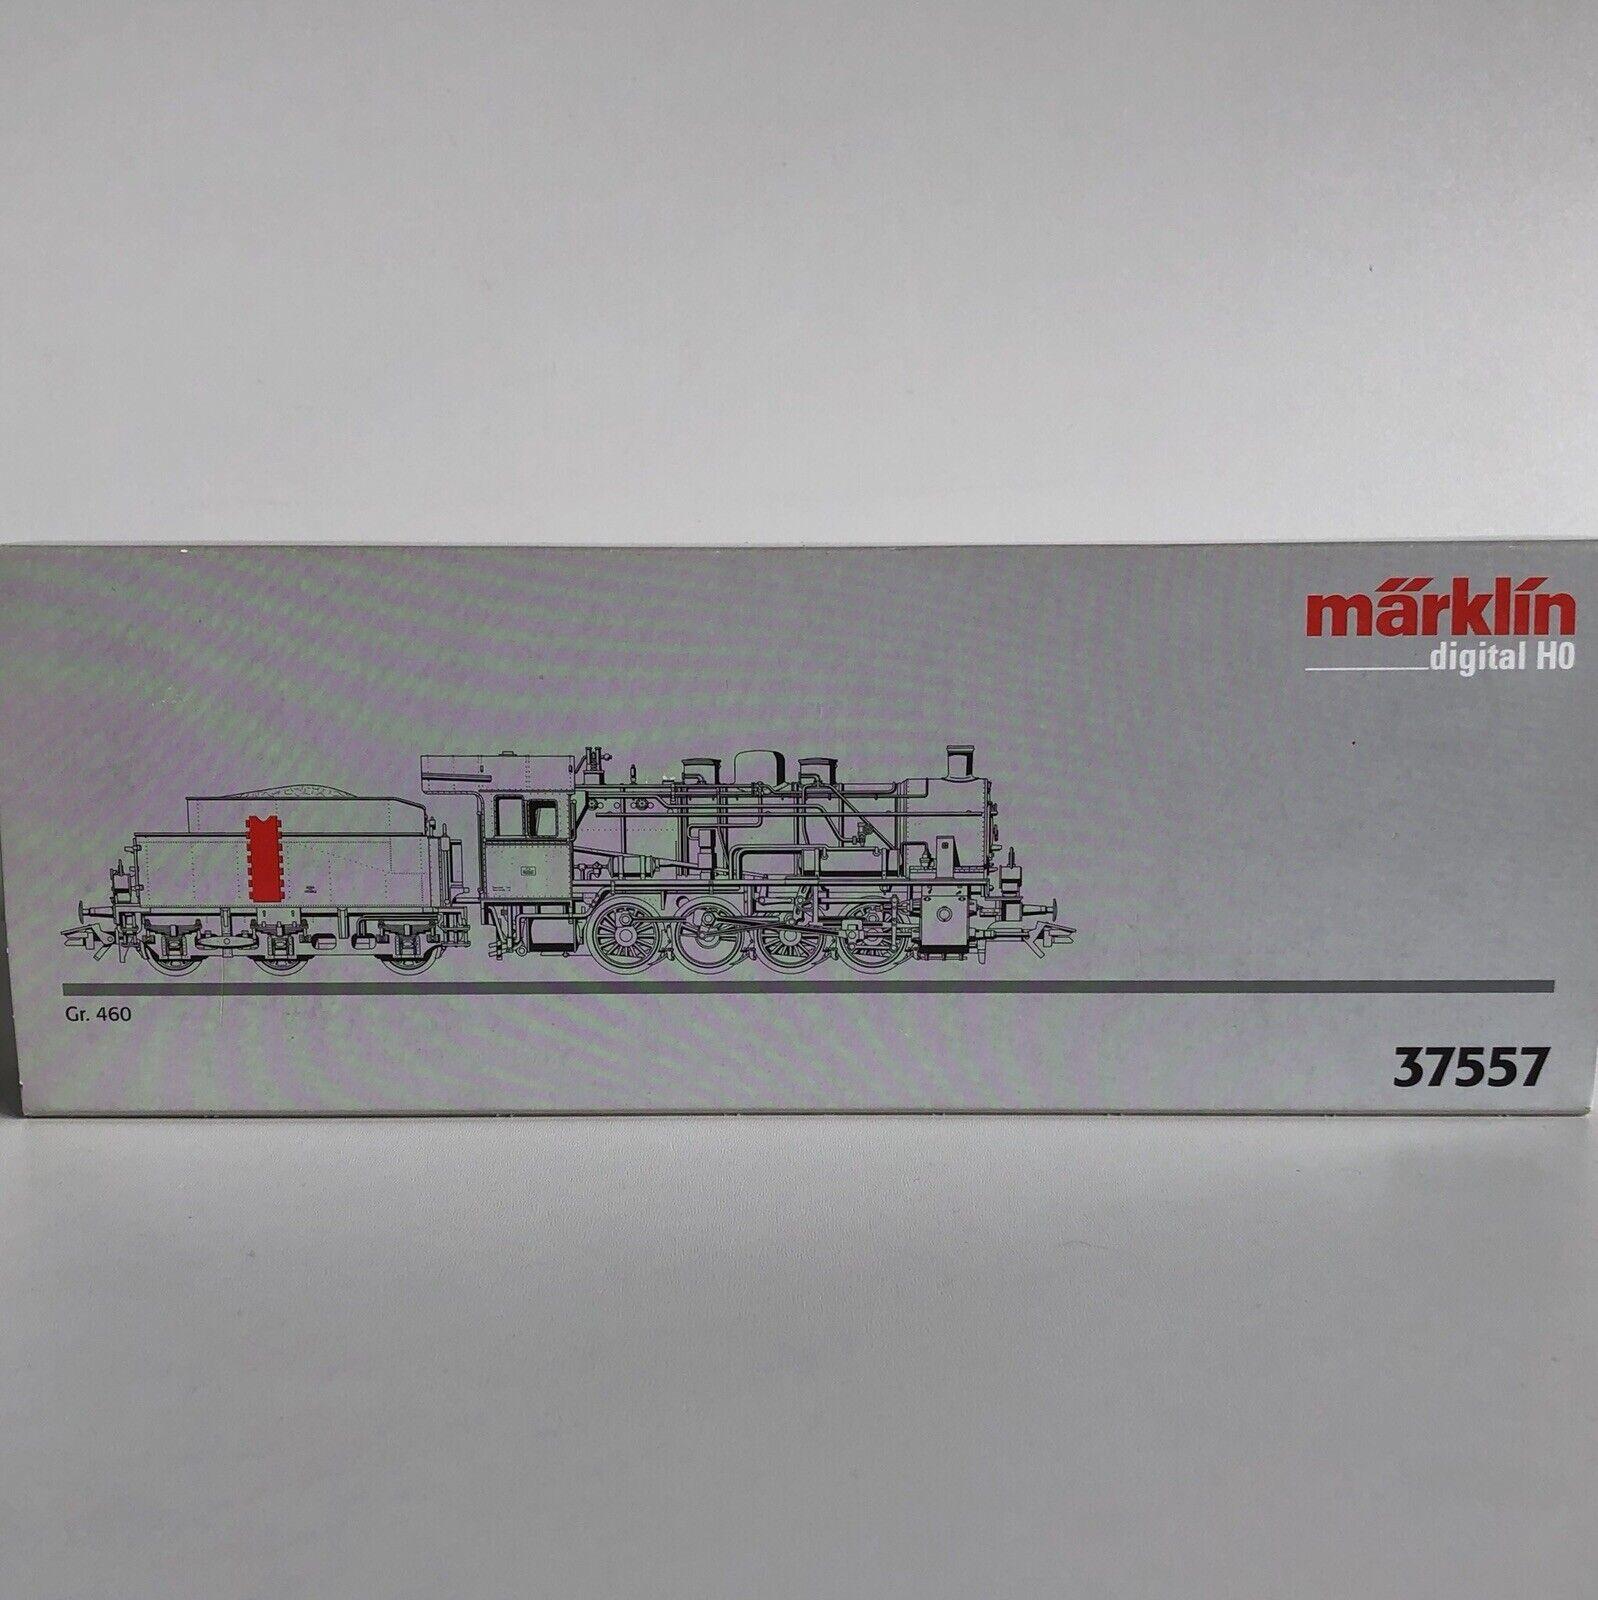 ( ) Marklin 37557 Digital FS Gr 460 037 Steam Lok Italian Railway